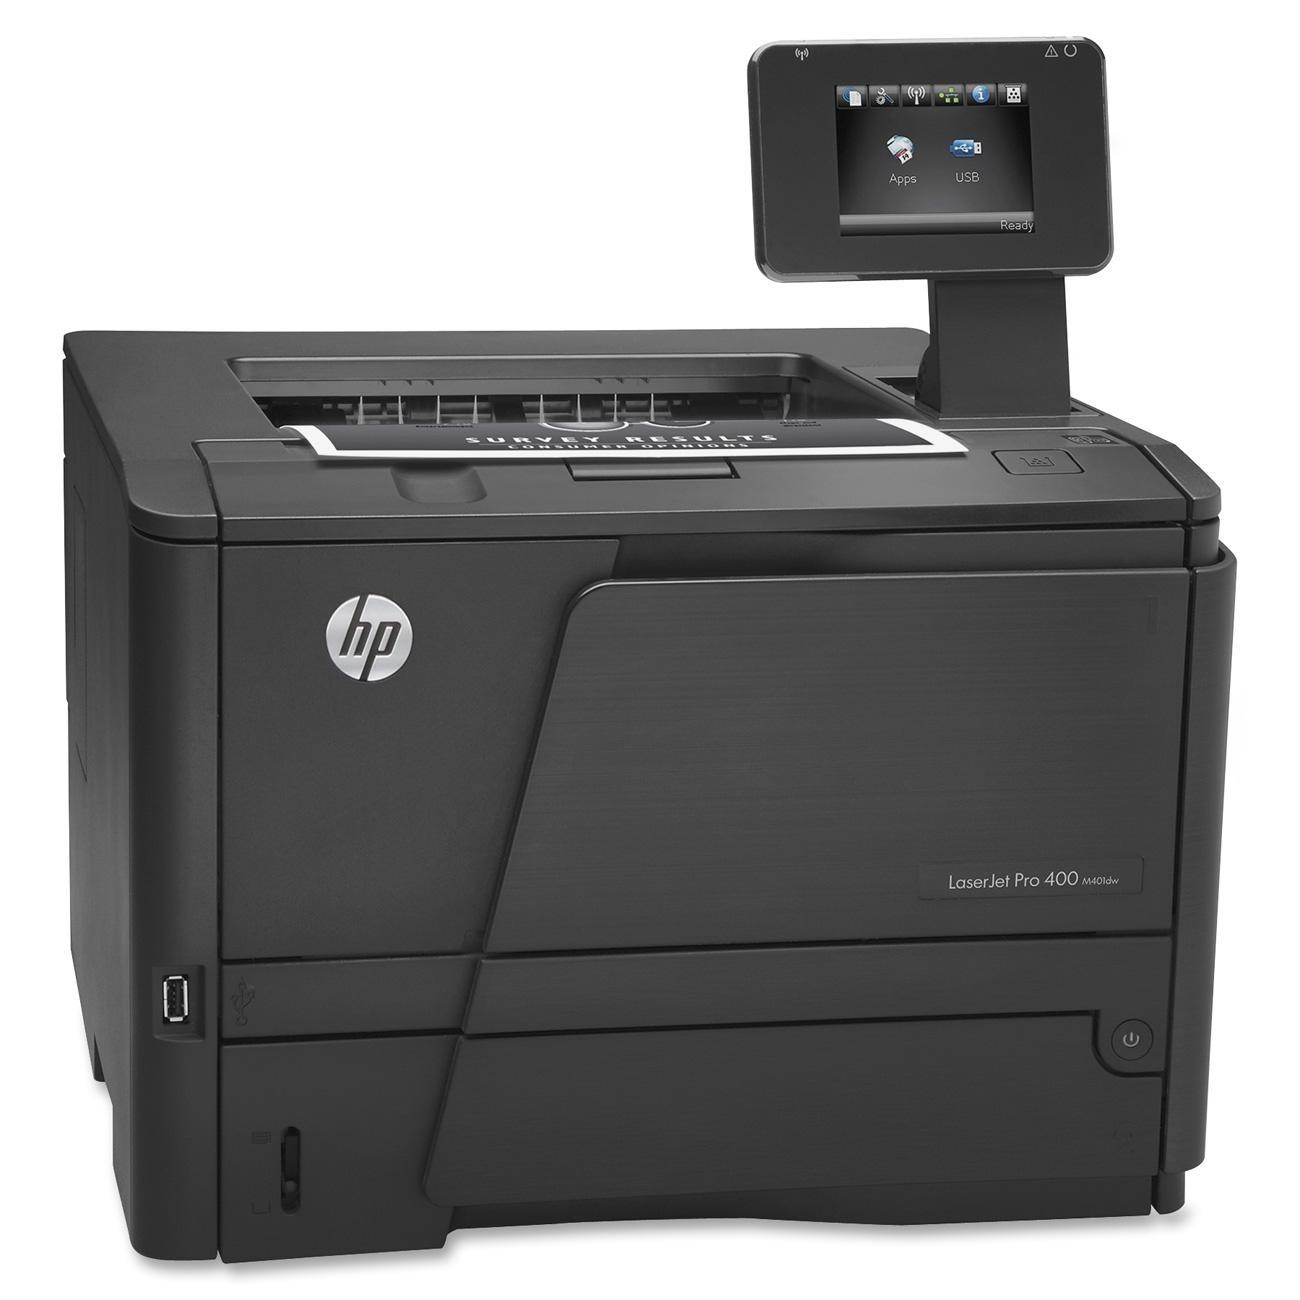 cf285a imprimante laserjet pro monochrome 400 m401dnw. Black Bedroom Furniture Sets. Home Design Ideas